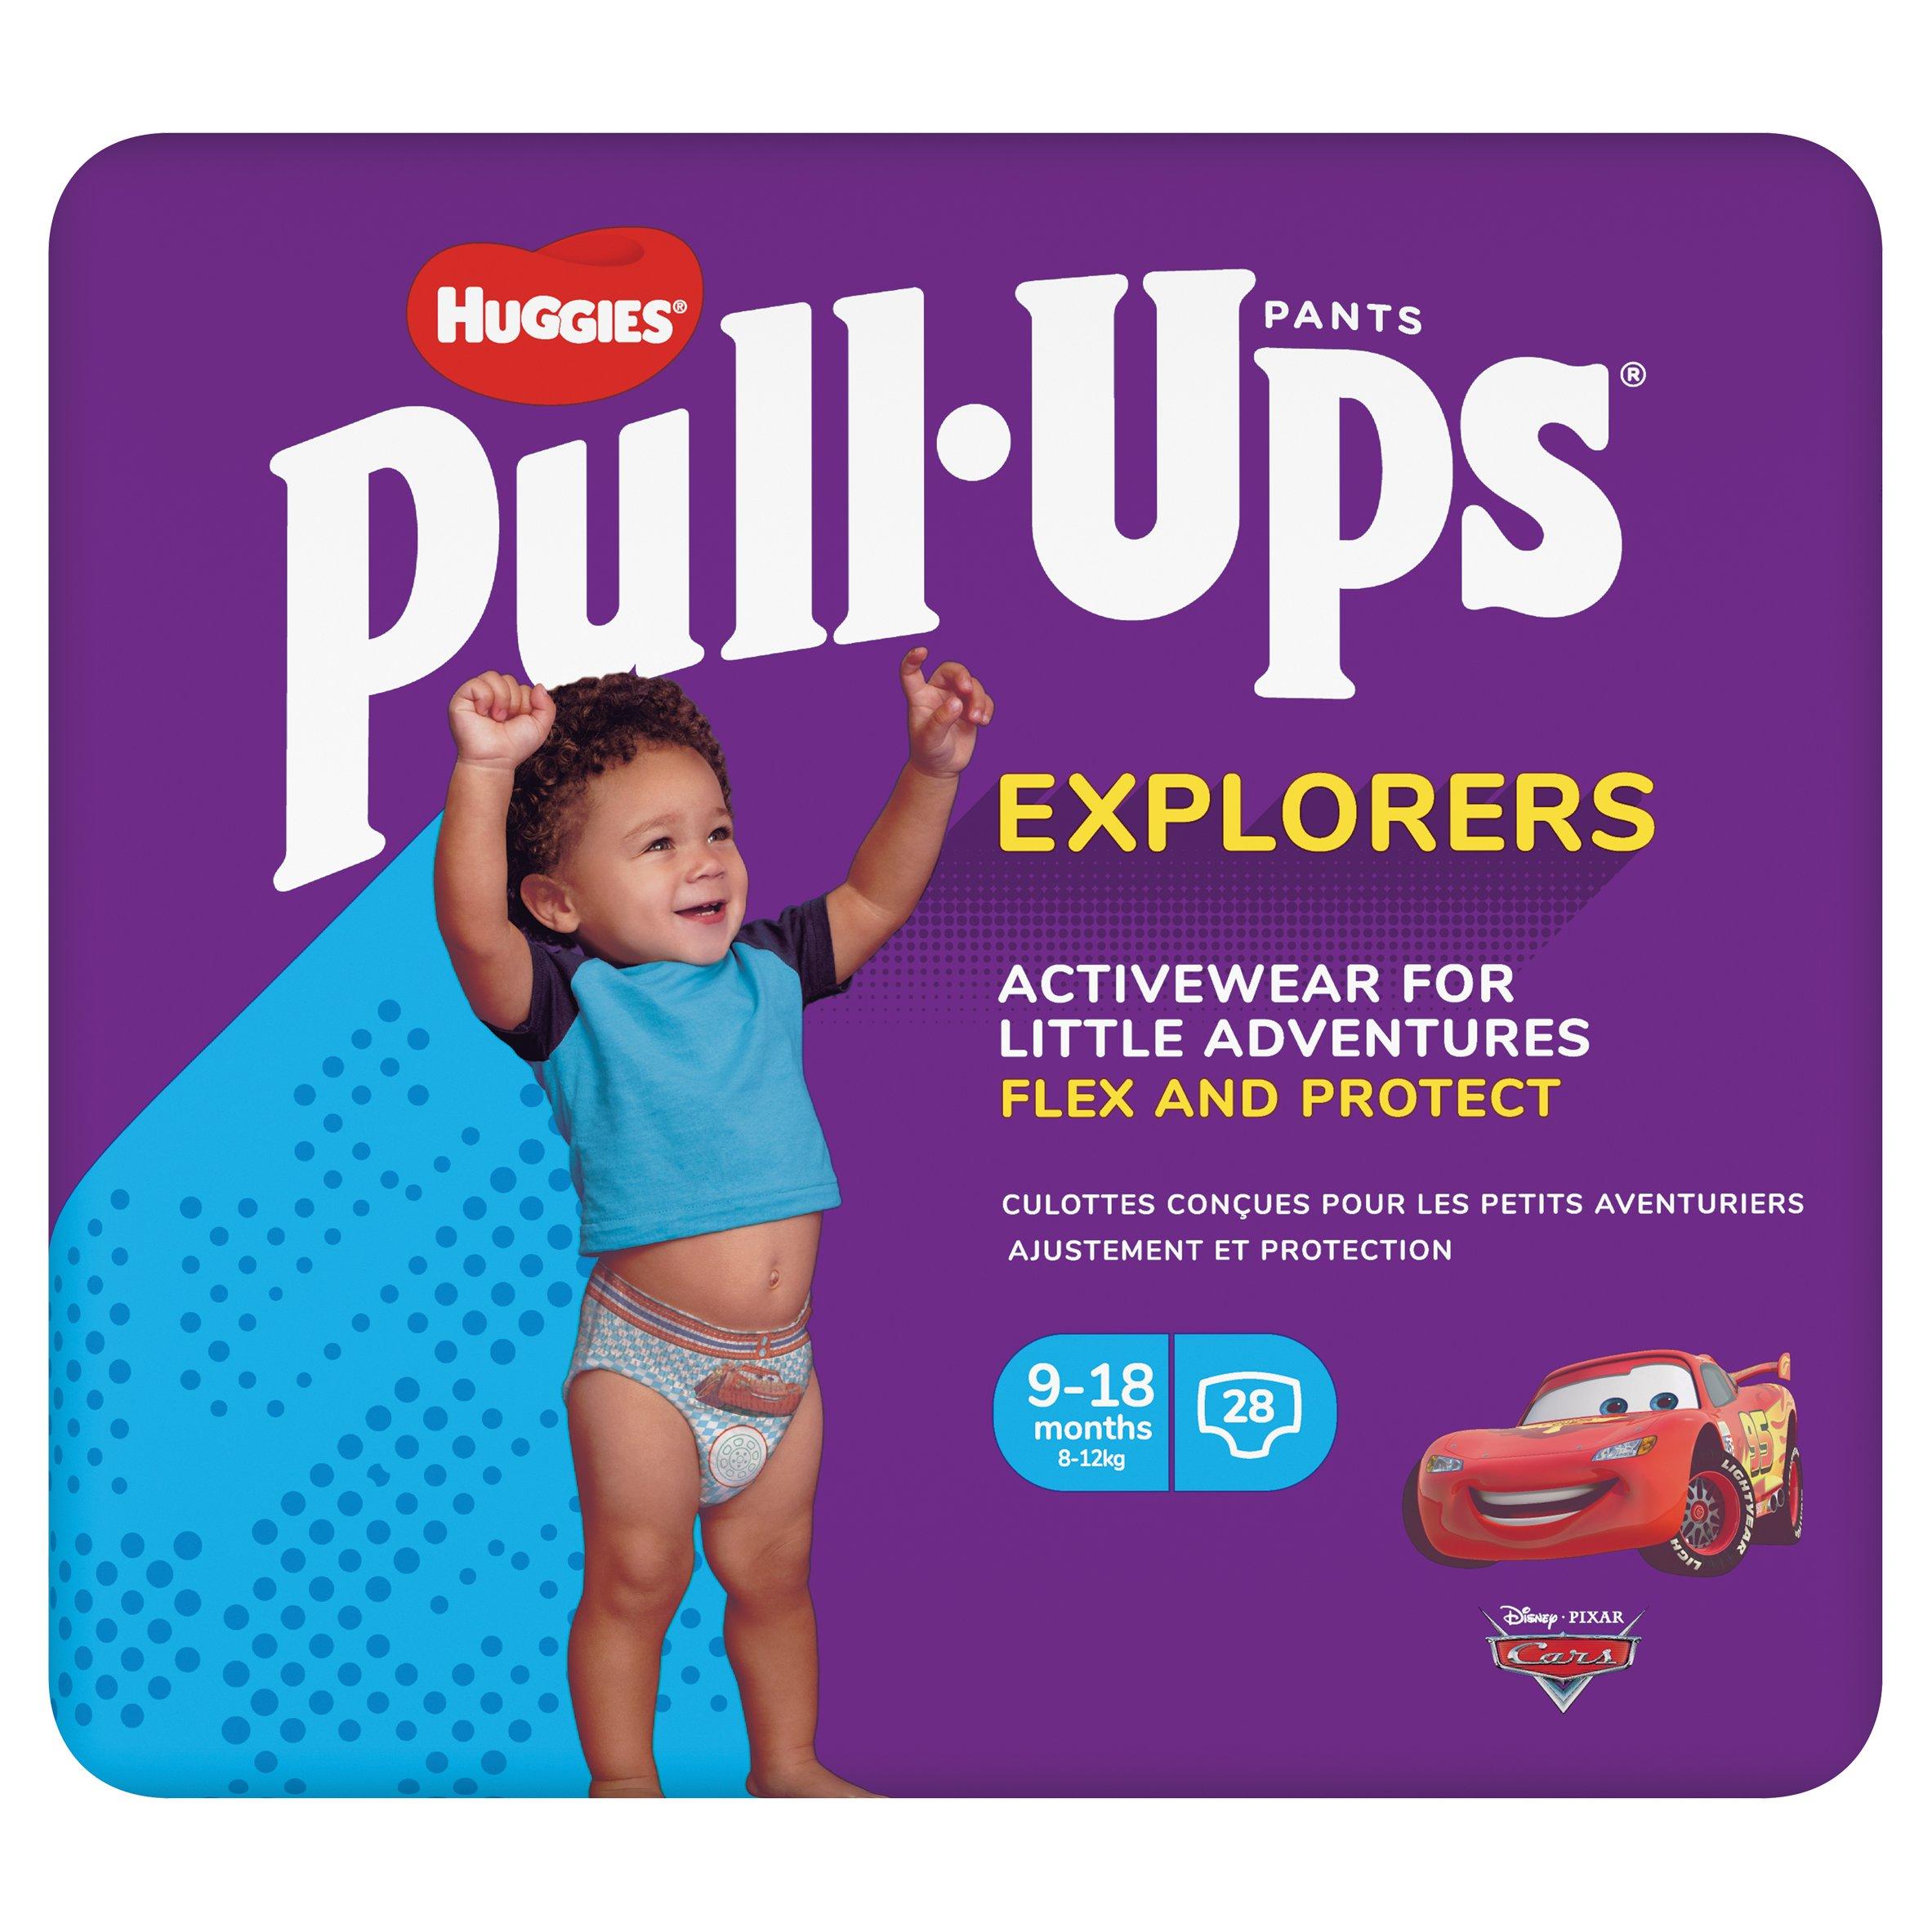 Huggies Pull Ups Explorers 9-18 Months Blue 28Pk